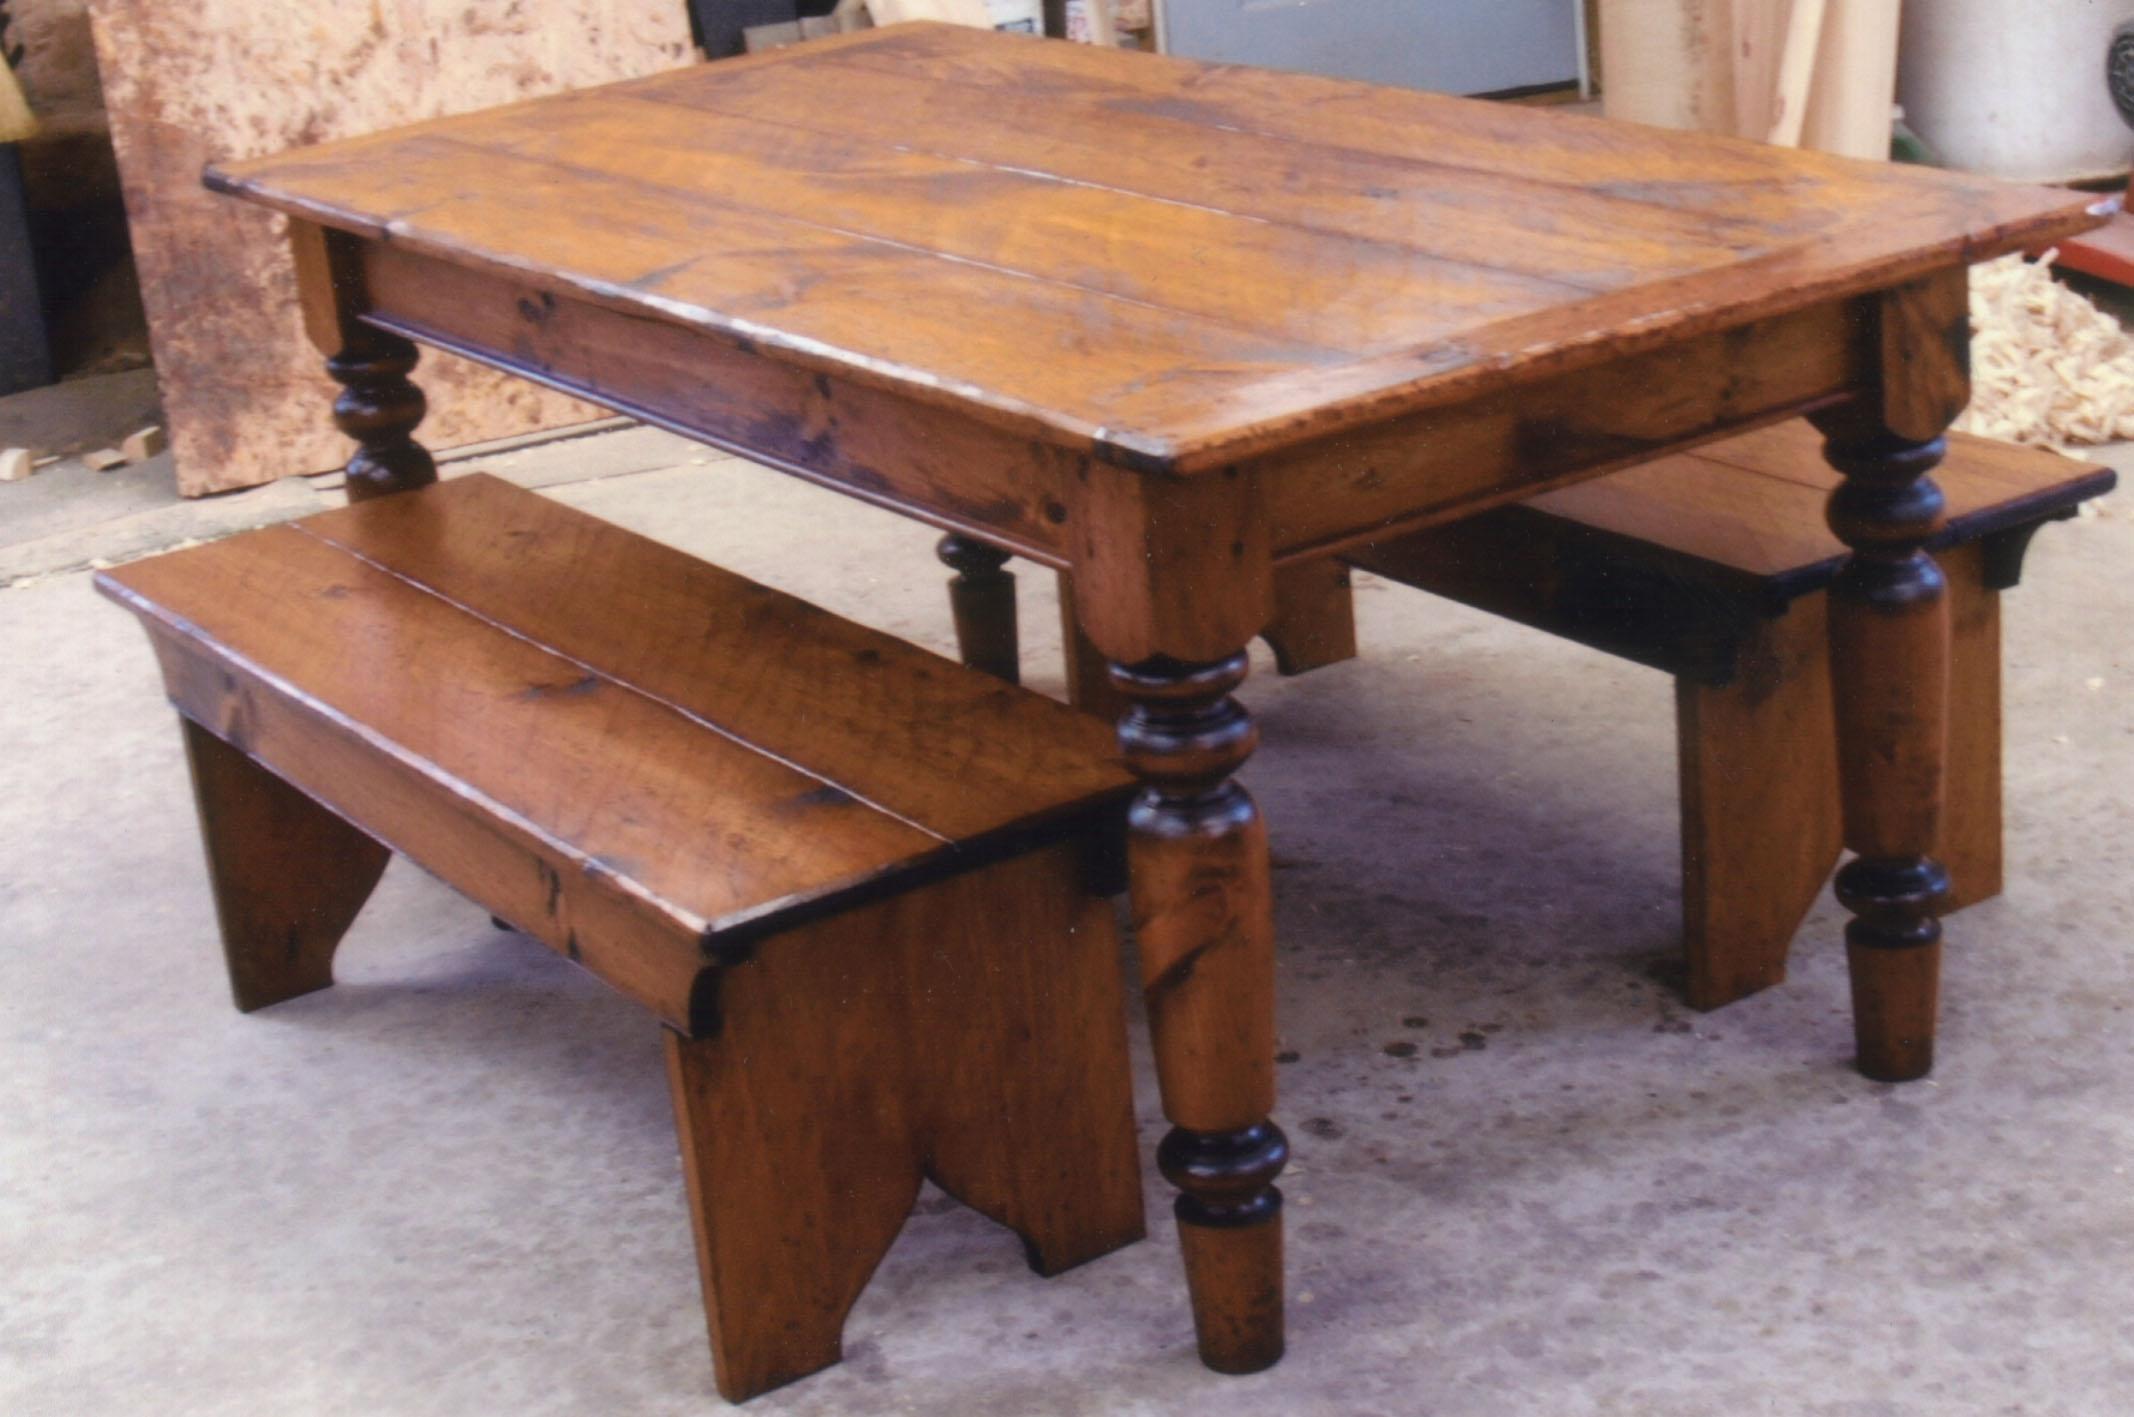 Kitchen bench table photo - 2